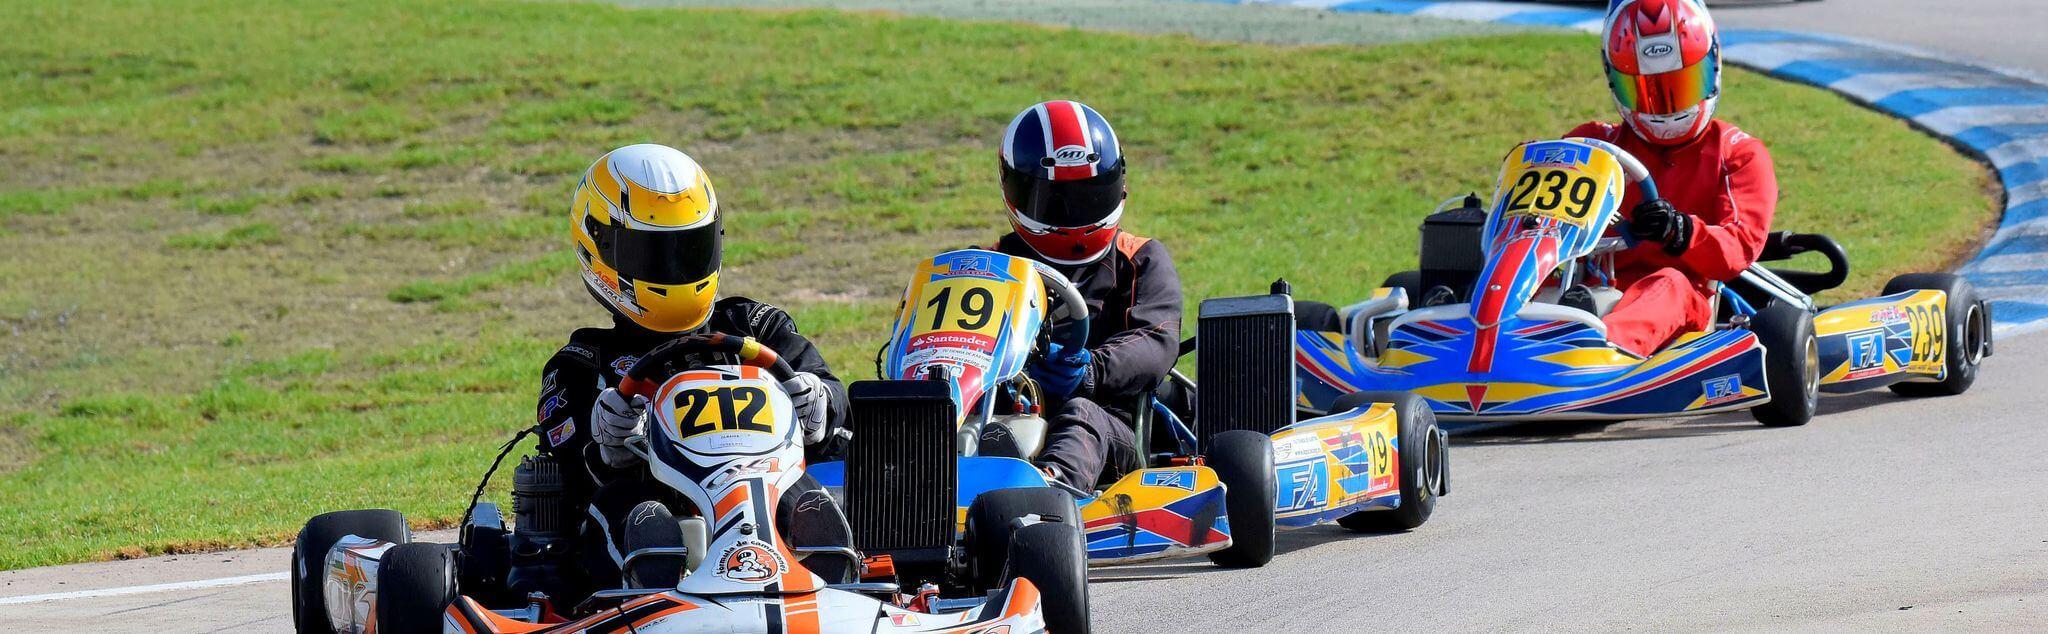 Karting dans Égletons